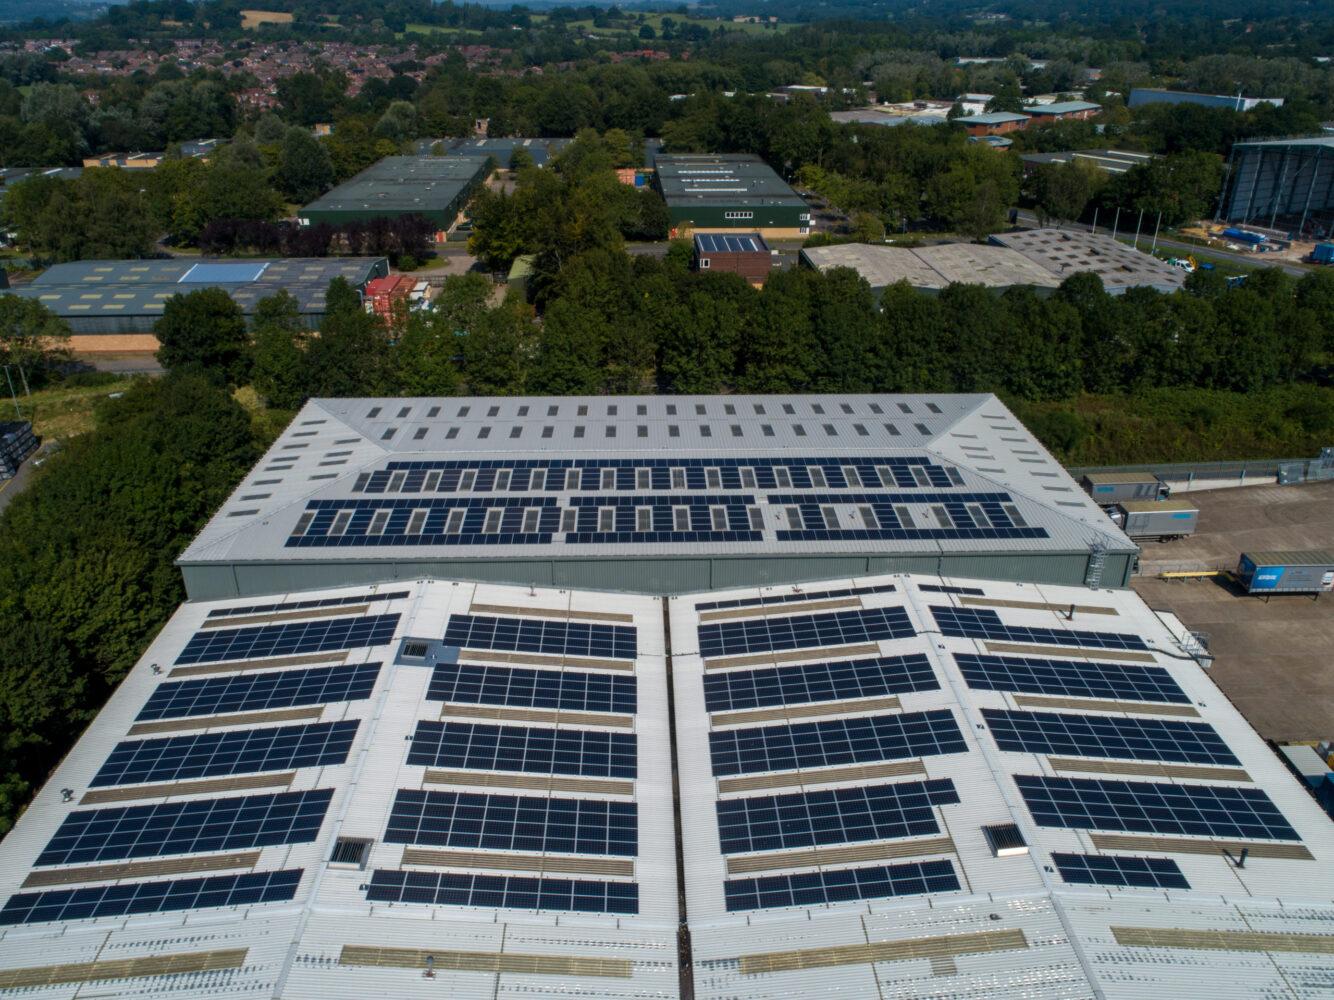 Thorlux Lighting's solar PV roof from Ineco Energy